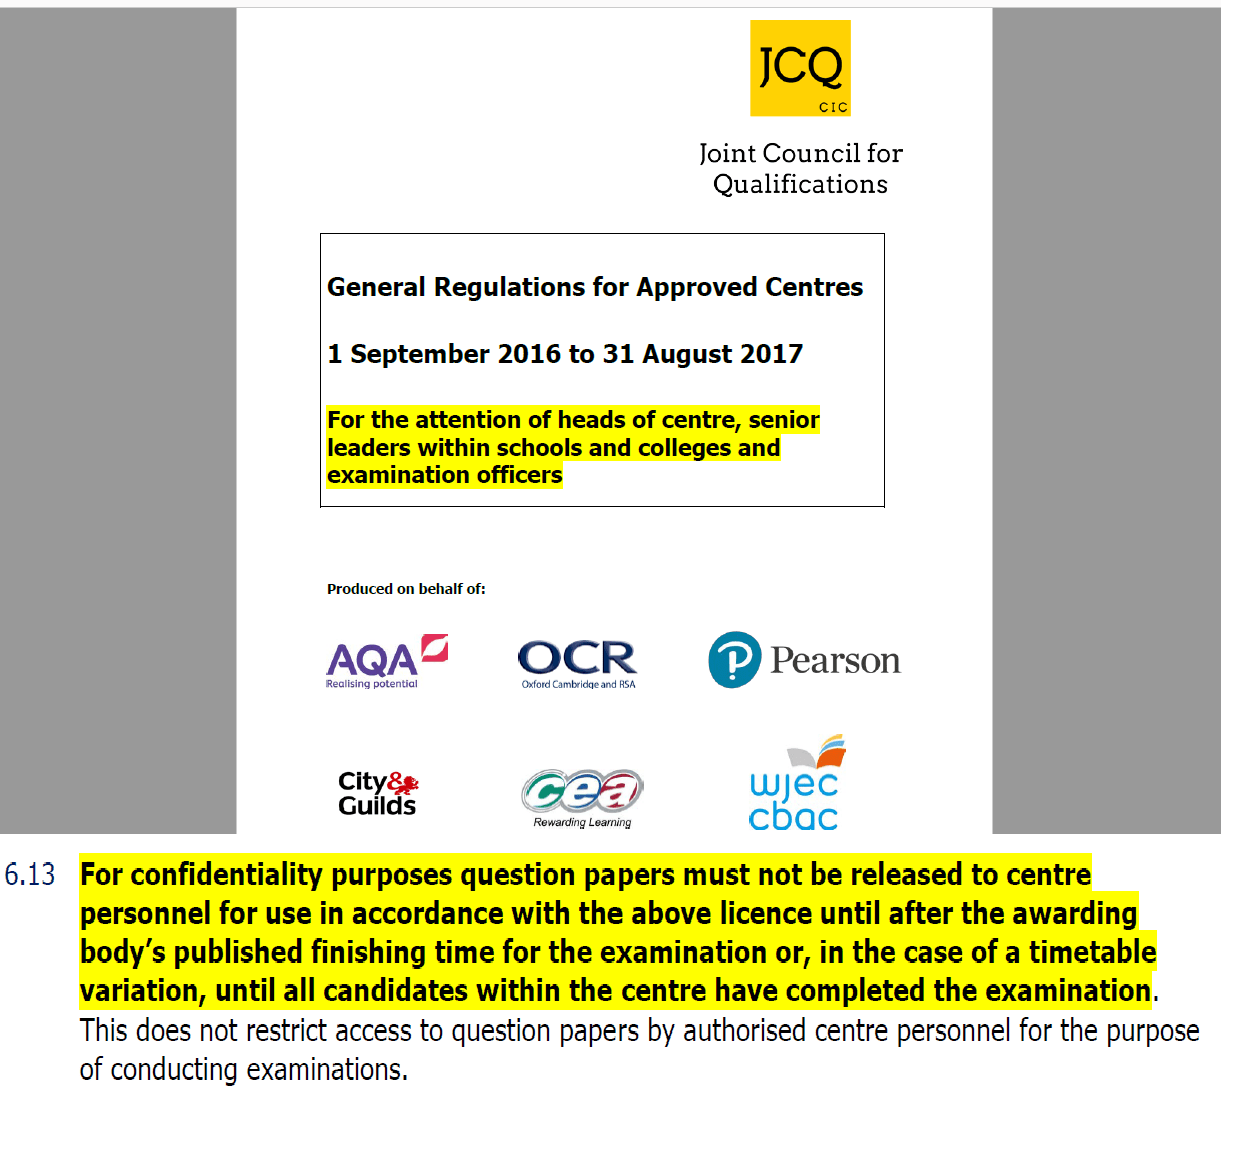 jcq instructions for conducting examinations